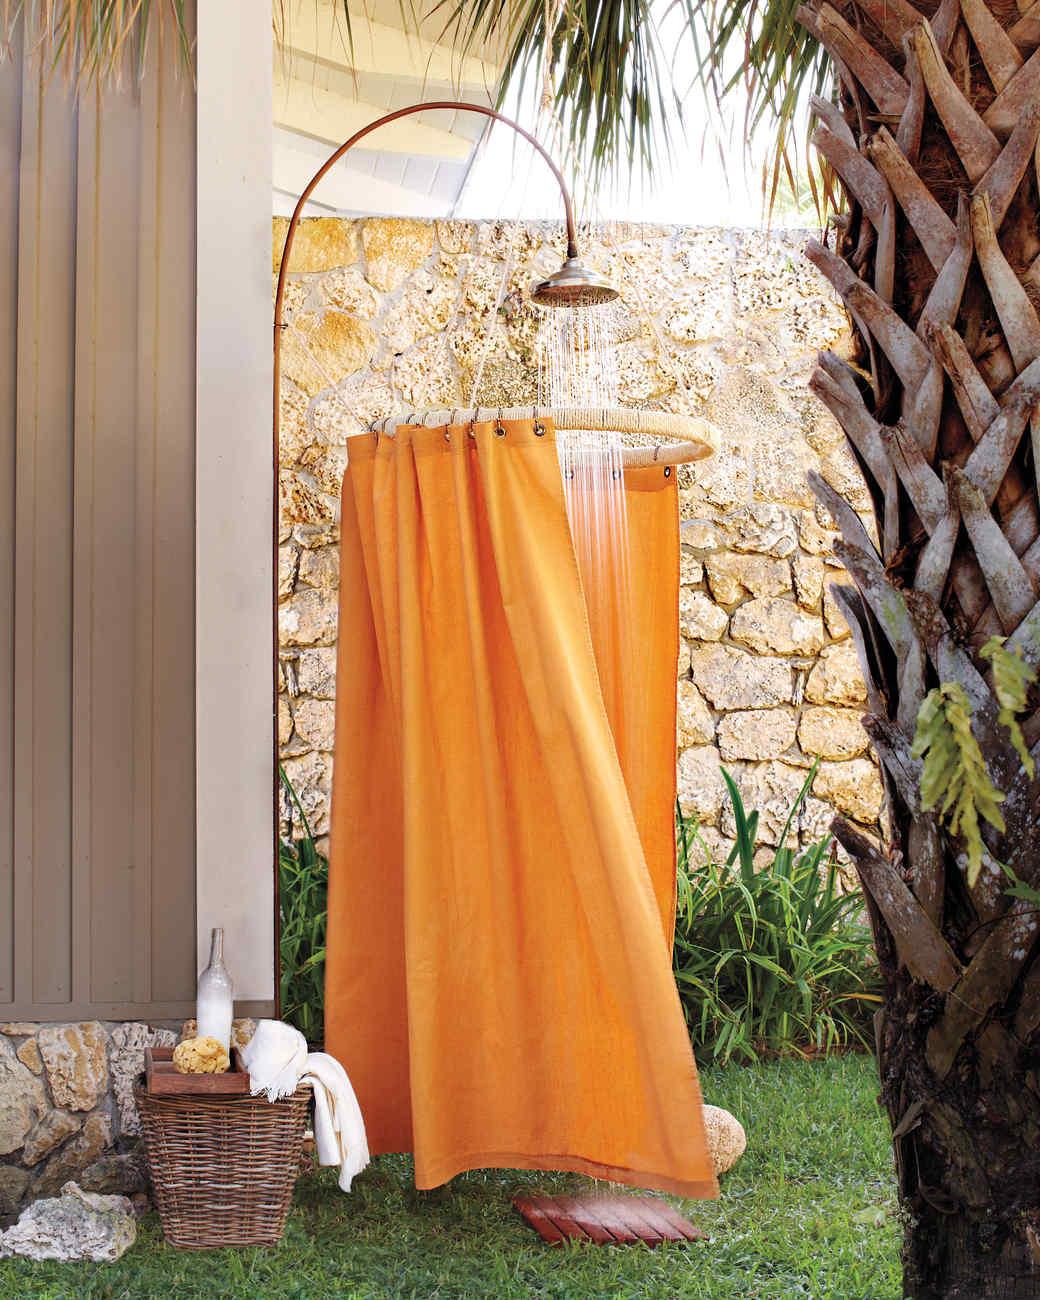 drop-cloth-shower-0555-mld109920.jpg